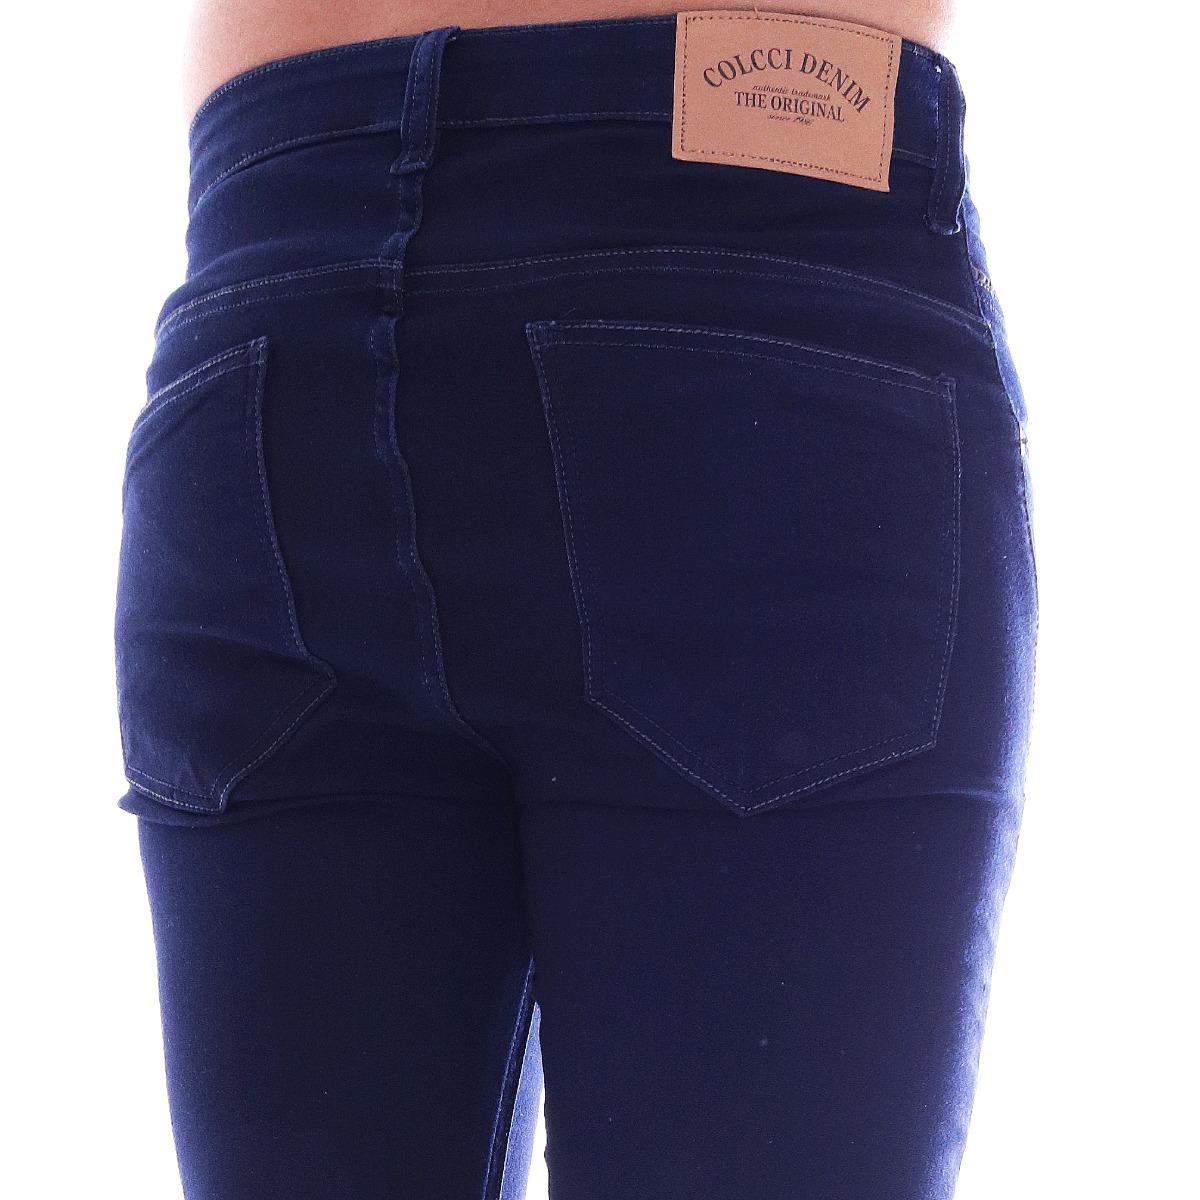 99a0f12c1 calça jeans masculina colcci skinny elastano stretch lycra. Carregando zoom.